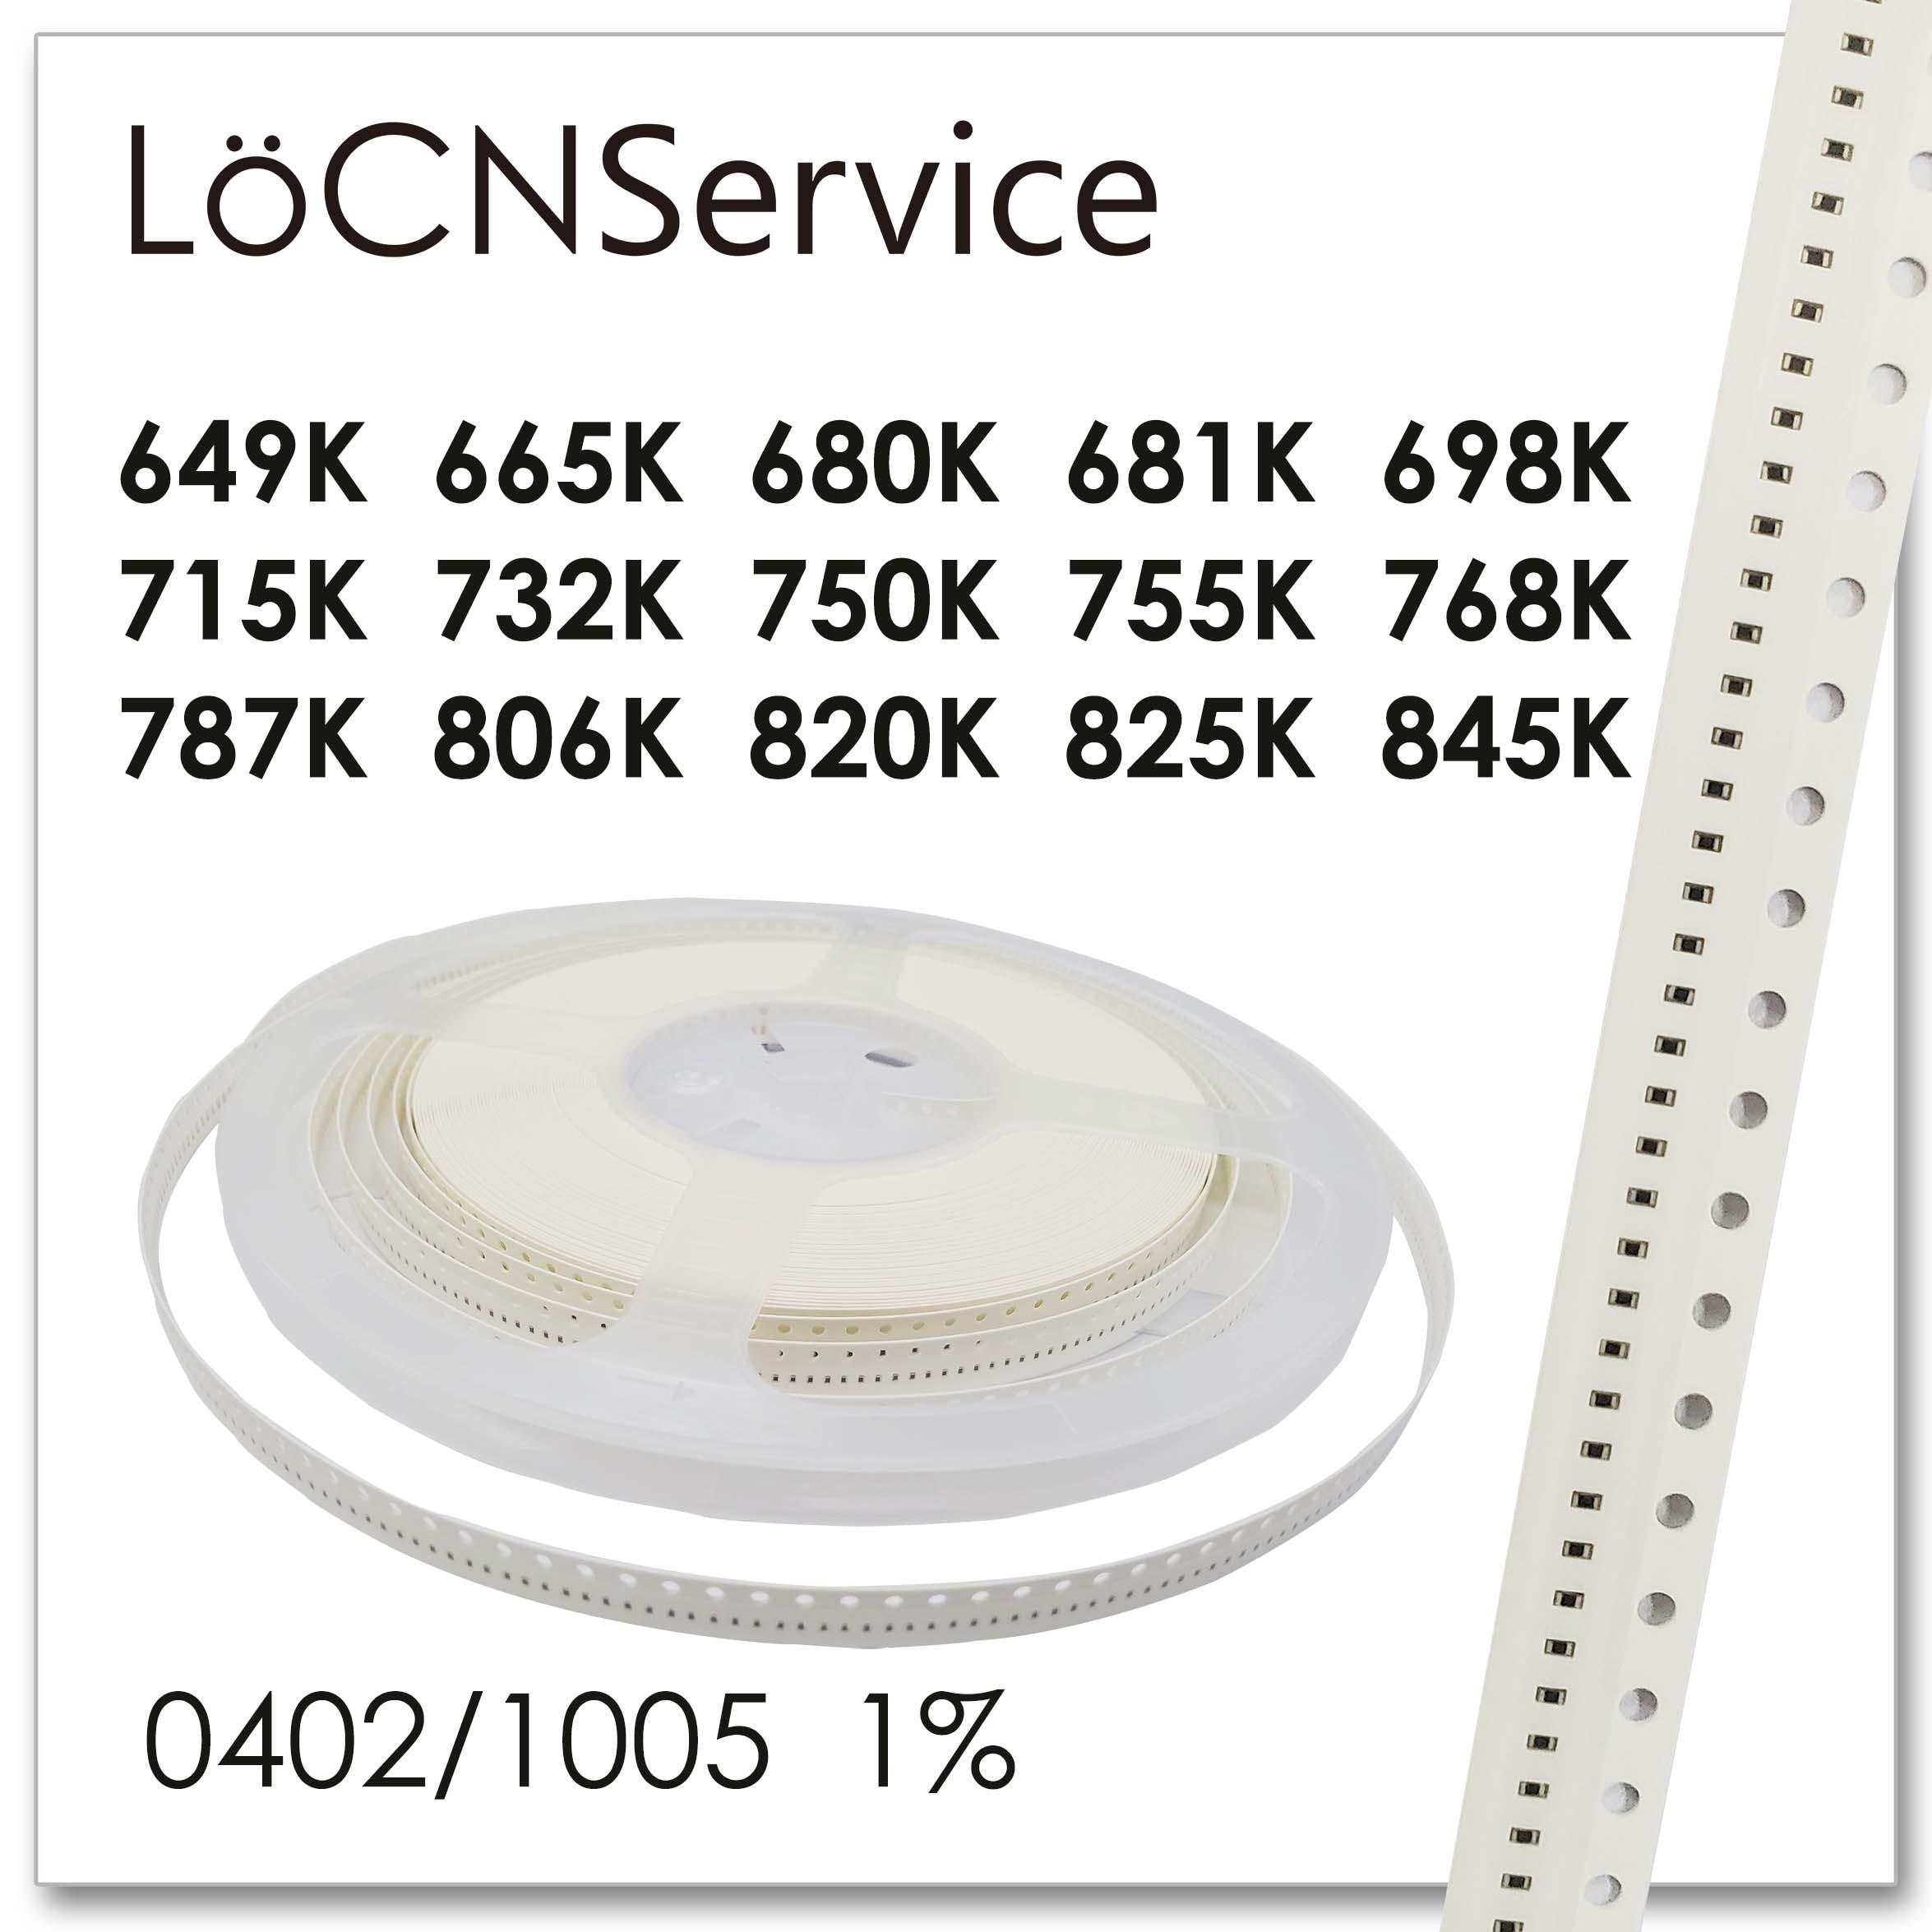 LoCNService 0402 1% 10000PCS 649K 665K 680K 681K 698K 715K 732K 750K 755K 768K 787K 806K 820K 825K 845K 1005 Resistor OHM